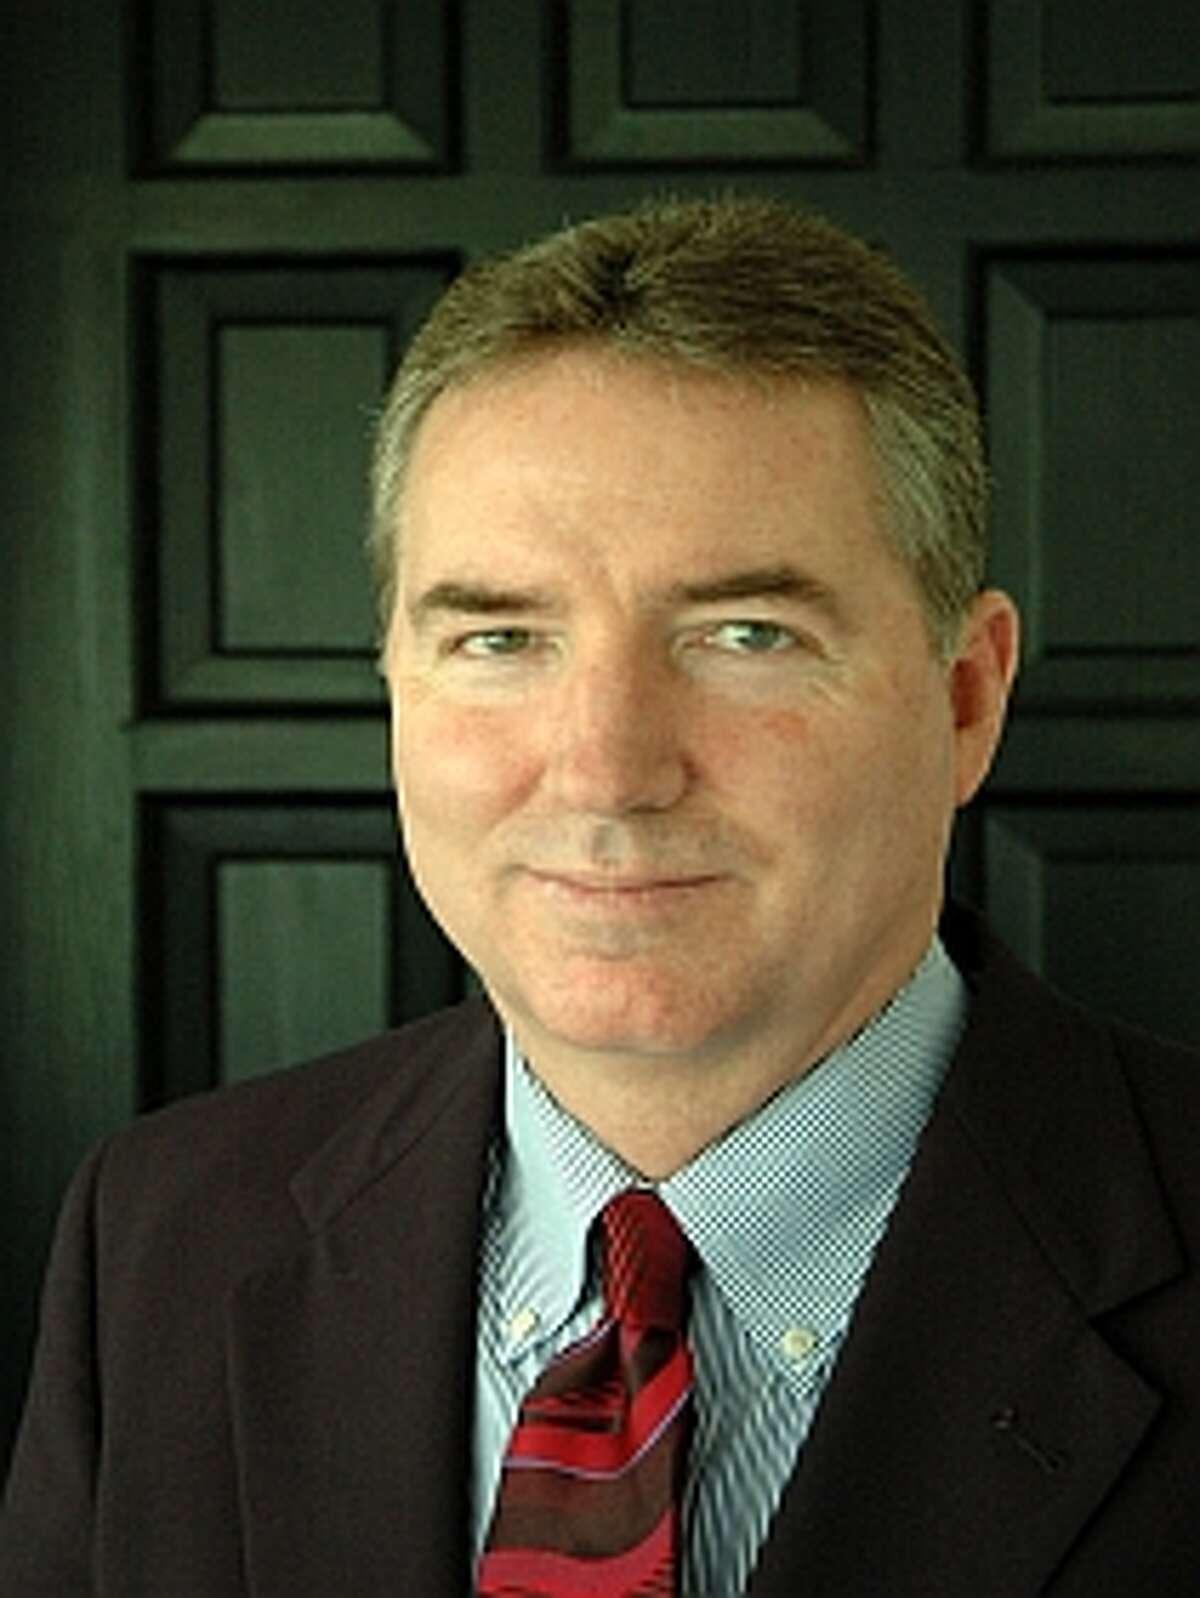 Judge William Adams. Photo courtesy of www.aransascountytx.gov/courtatlaw/